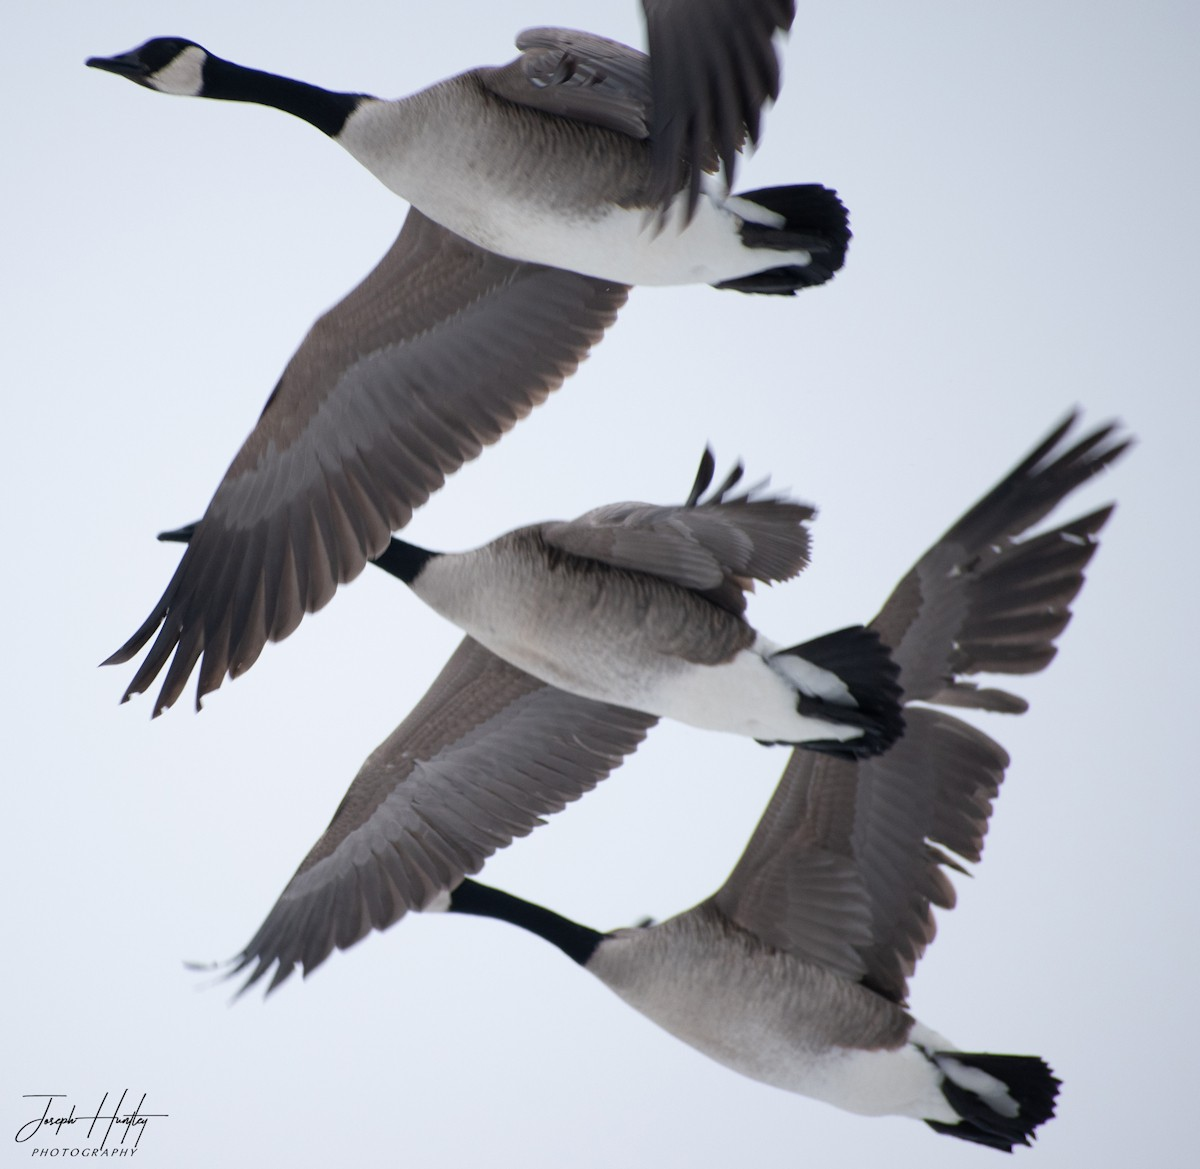 Goose-0837.jpg